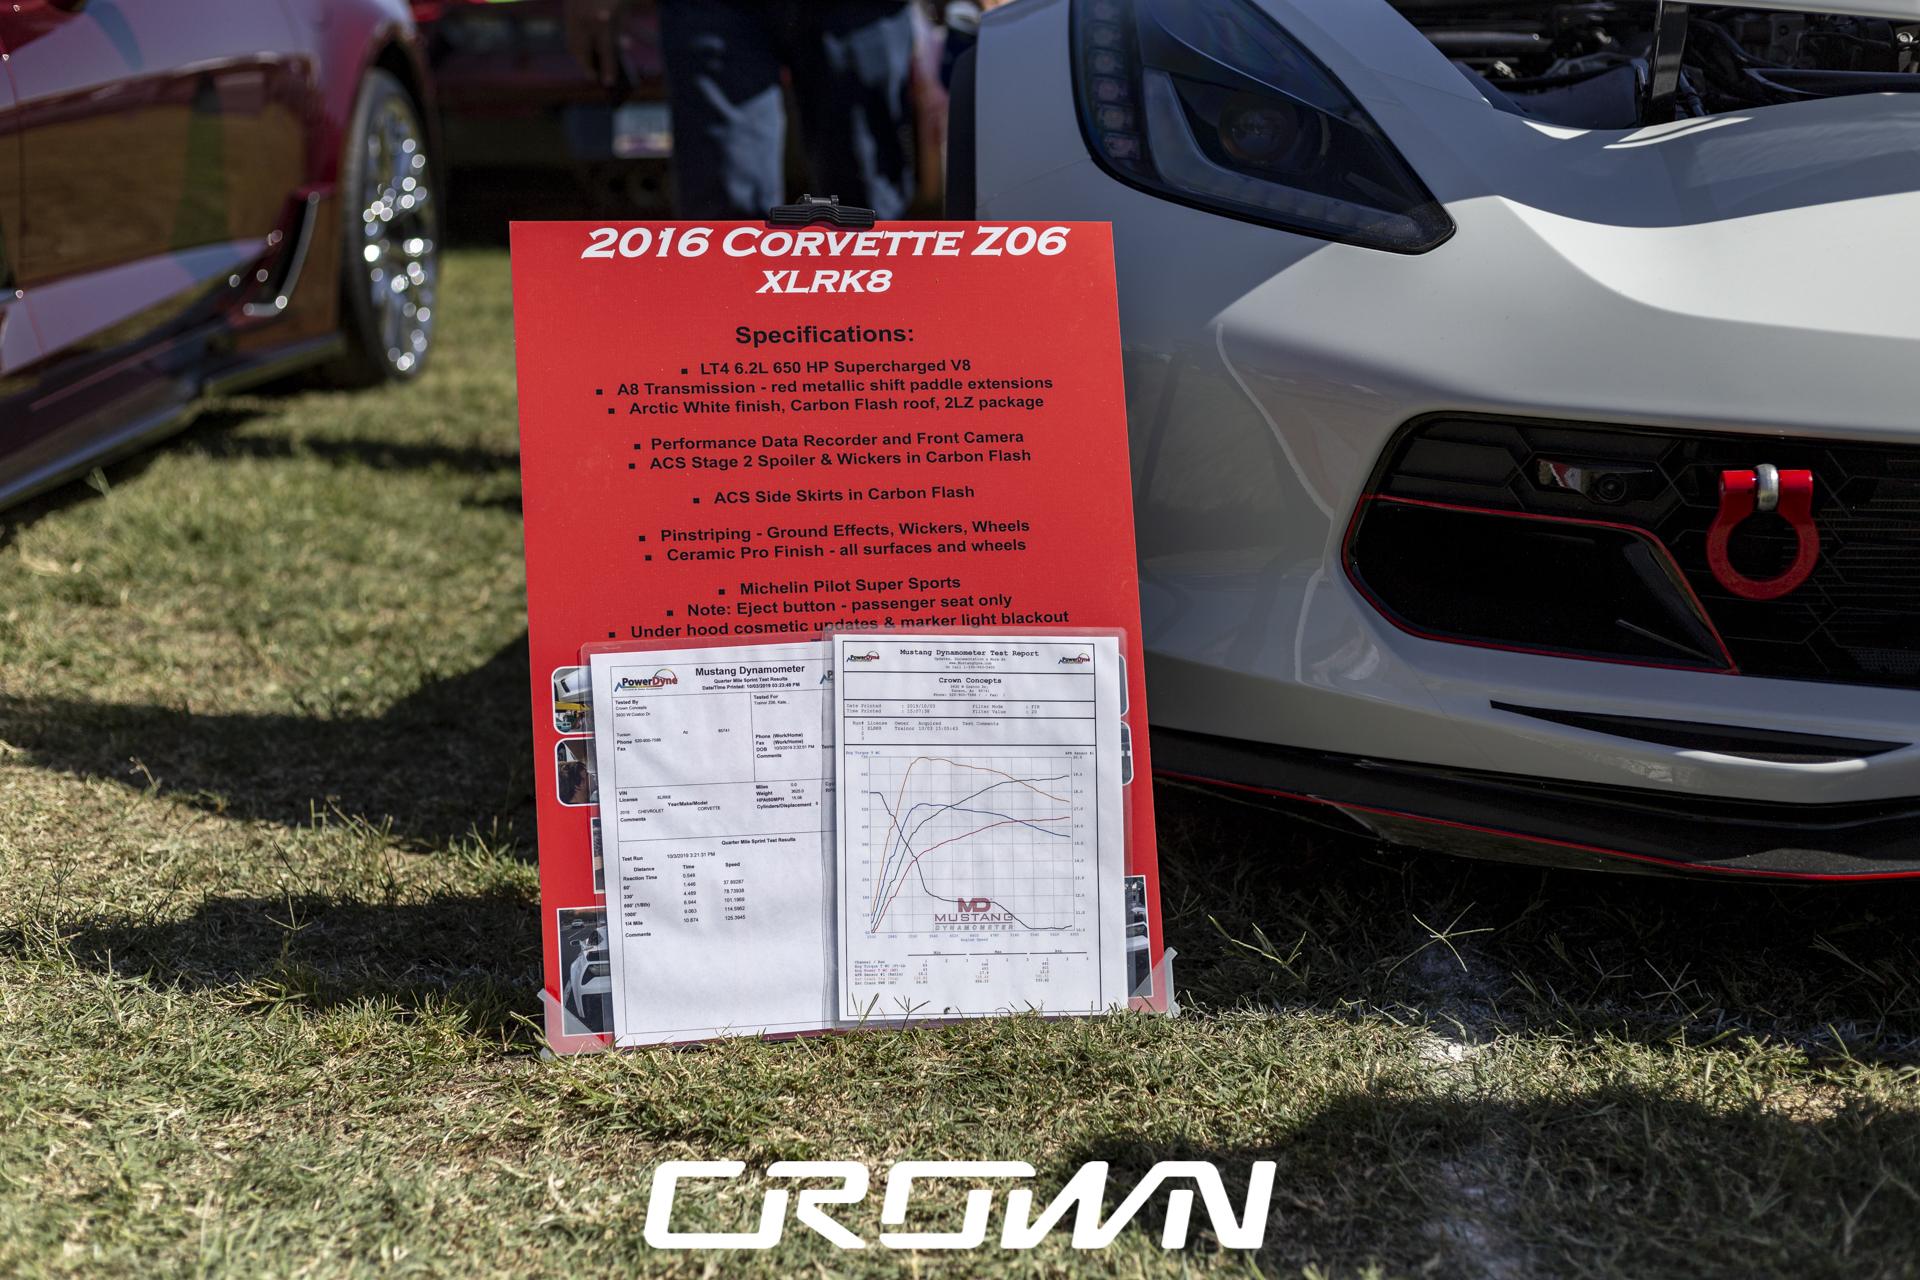 Kate C7 Corvette Z06 Tucson Classic Car Show